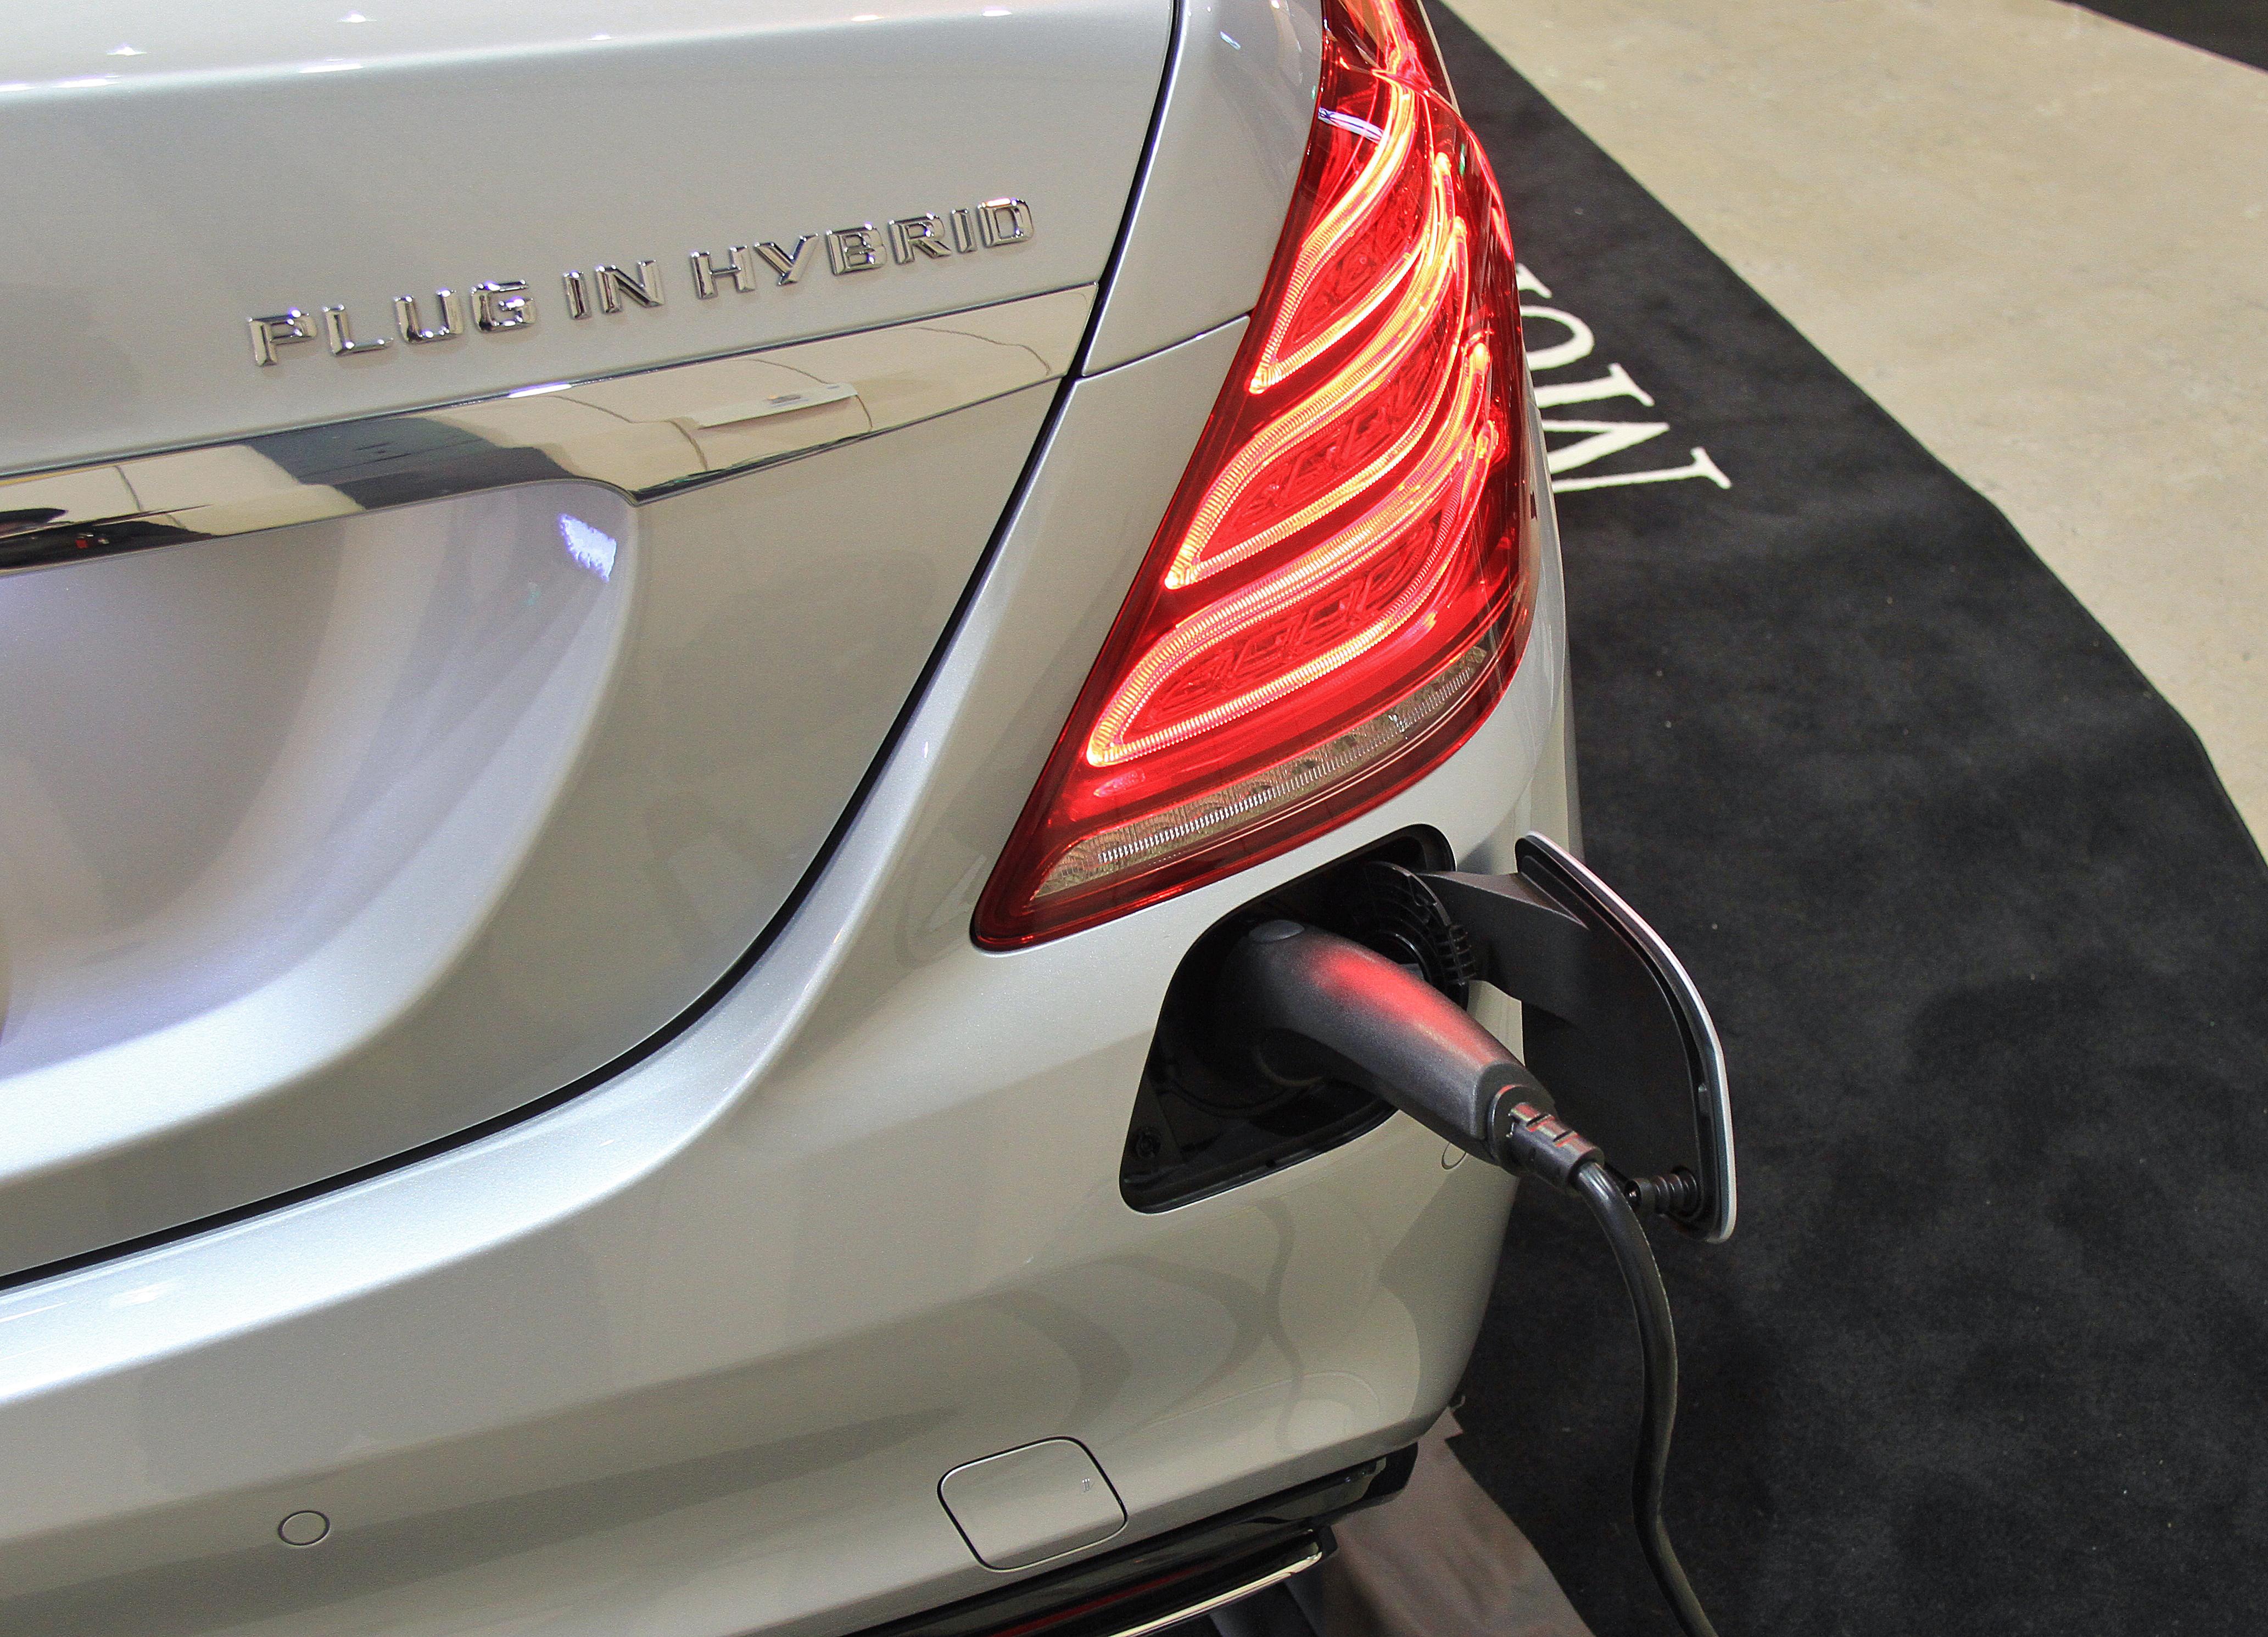 filemercedes benz s550 plug in hybrid long chargingjpg - S550 Plug In Hybrid